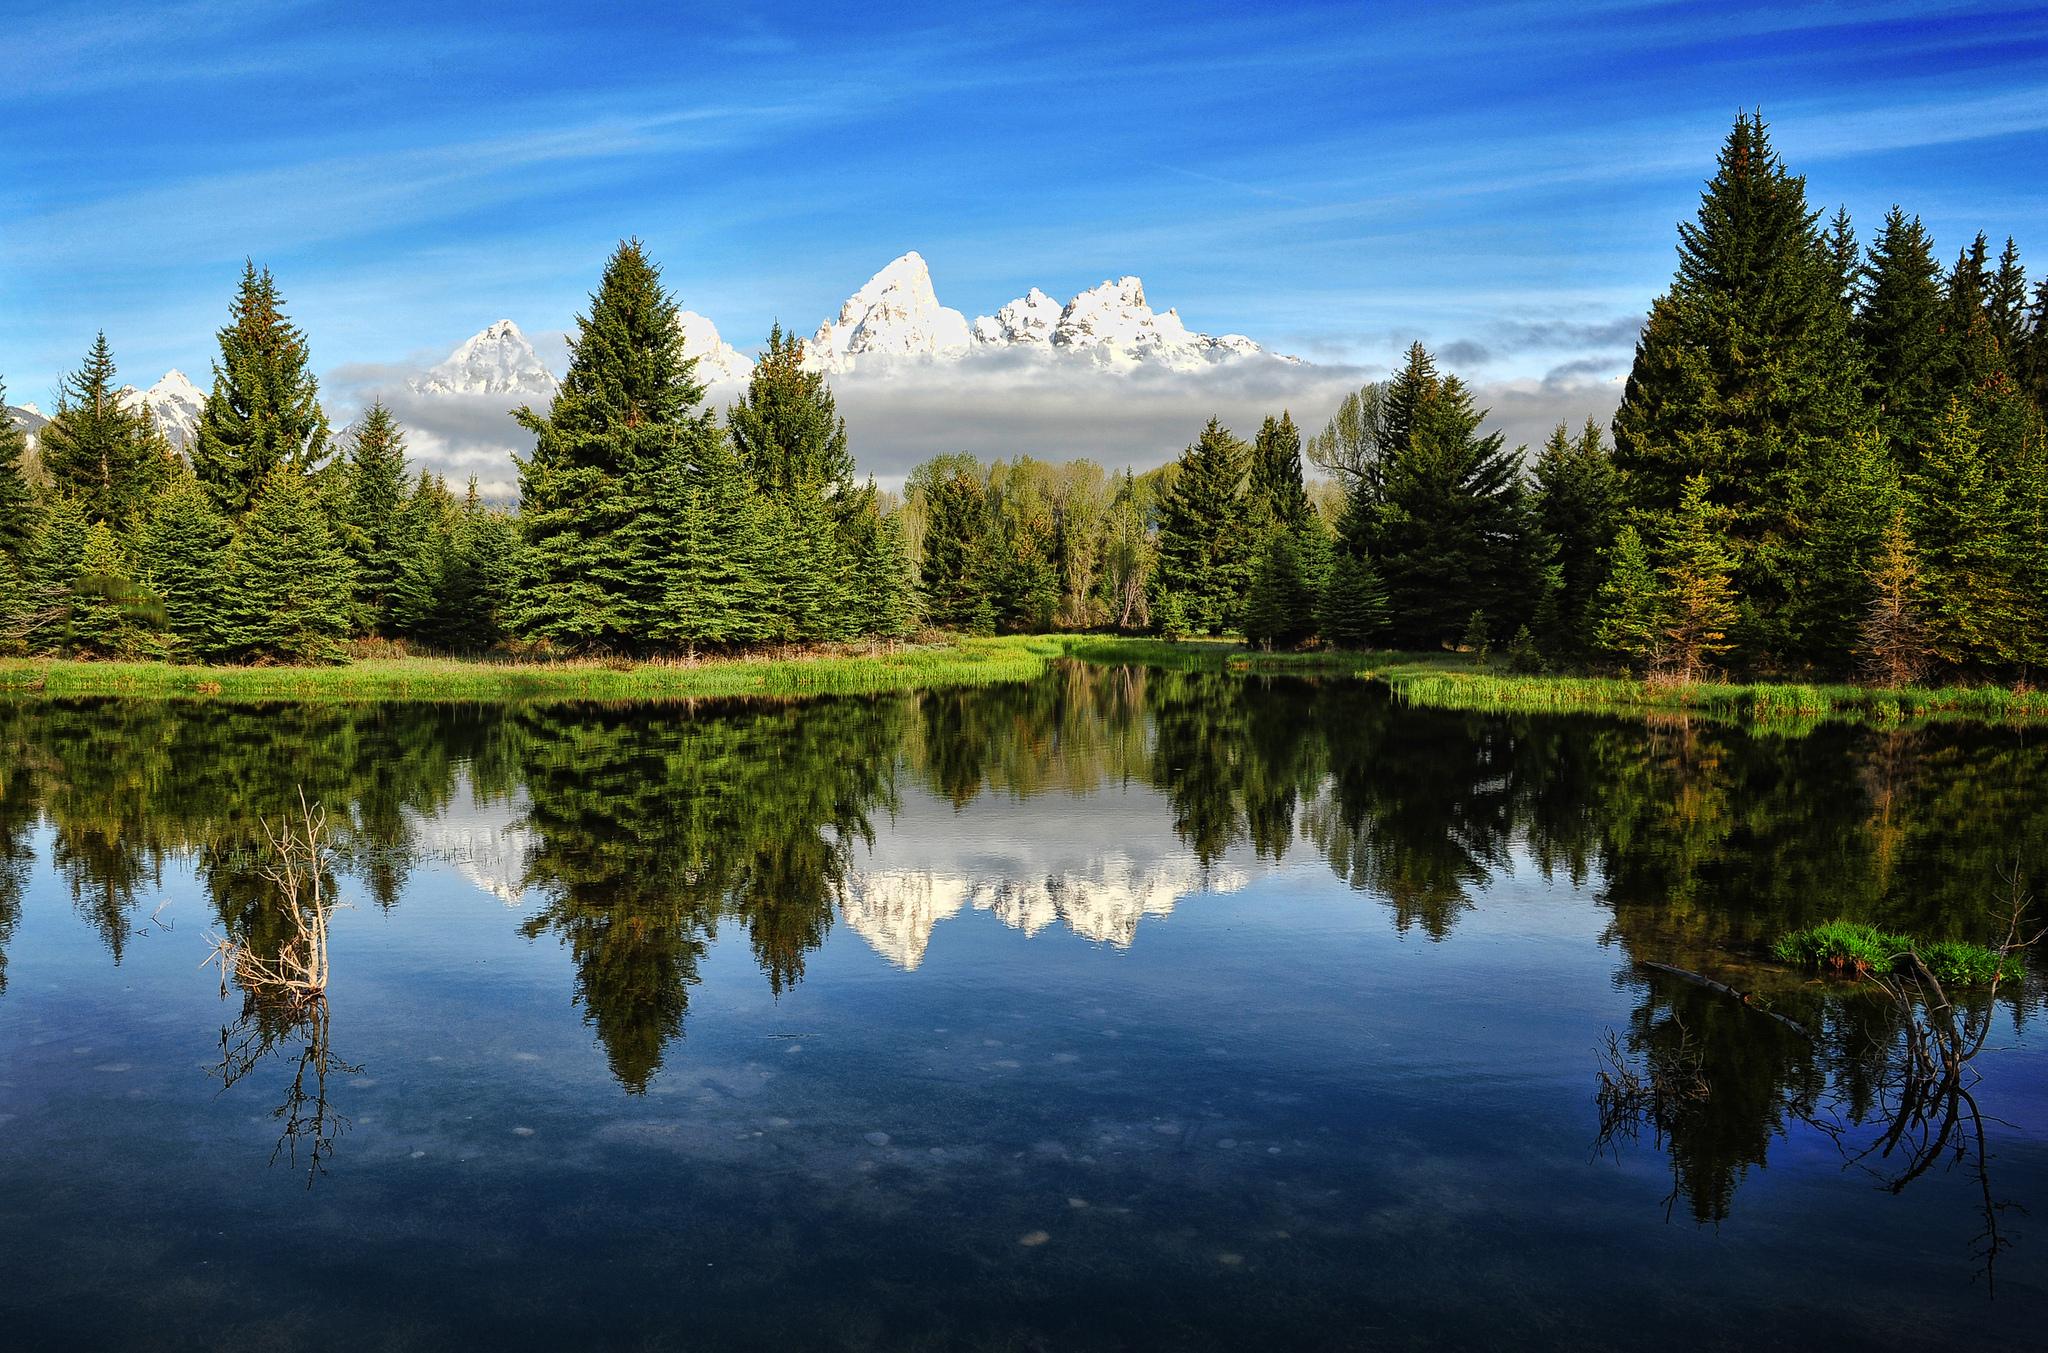 озеро гора ели бесплатно